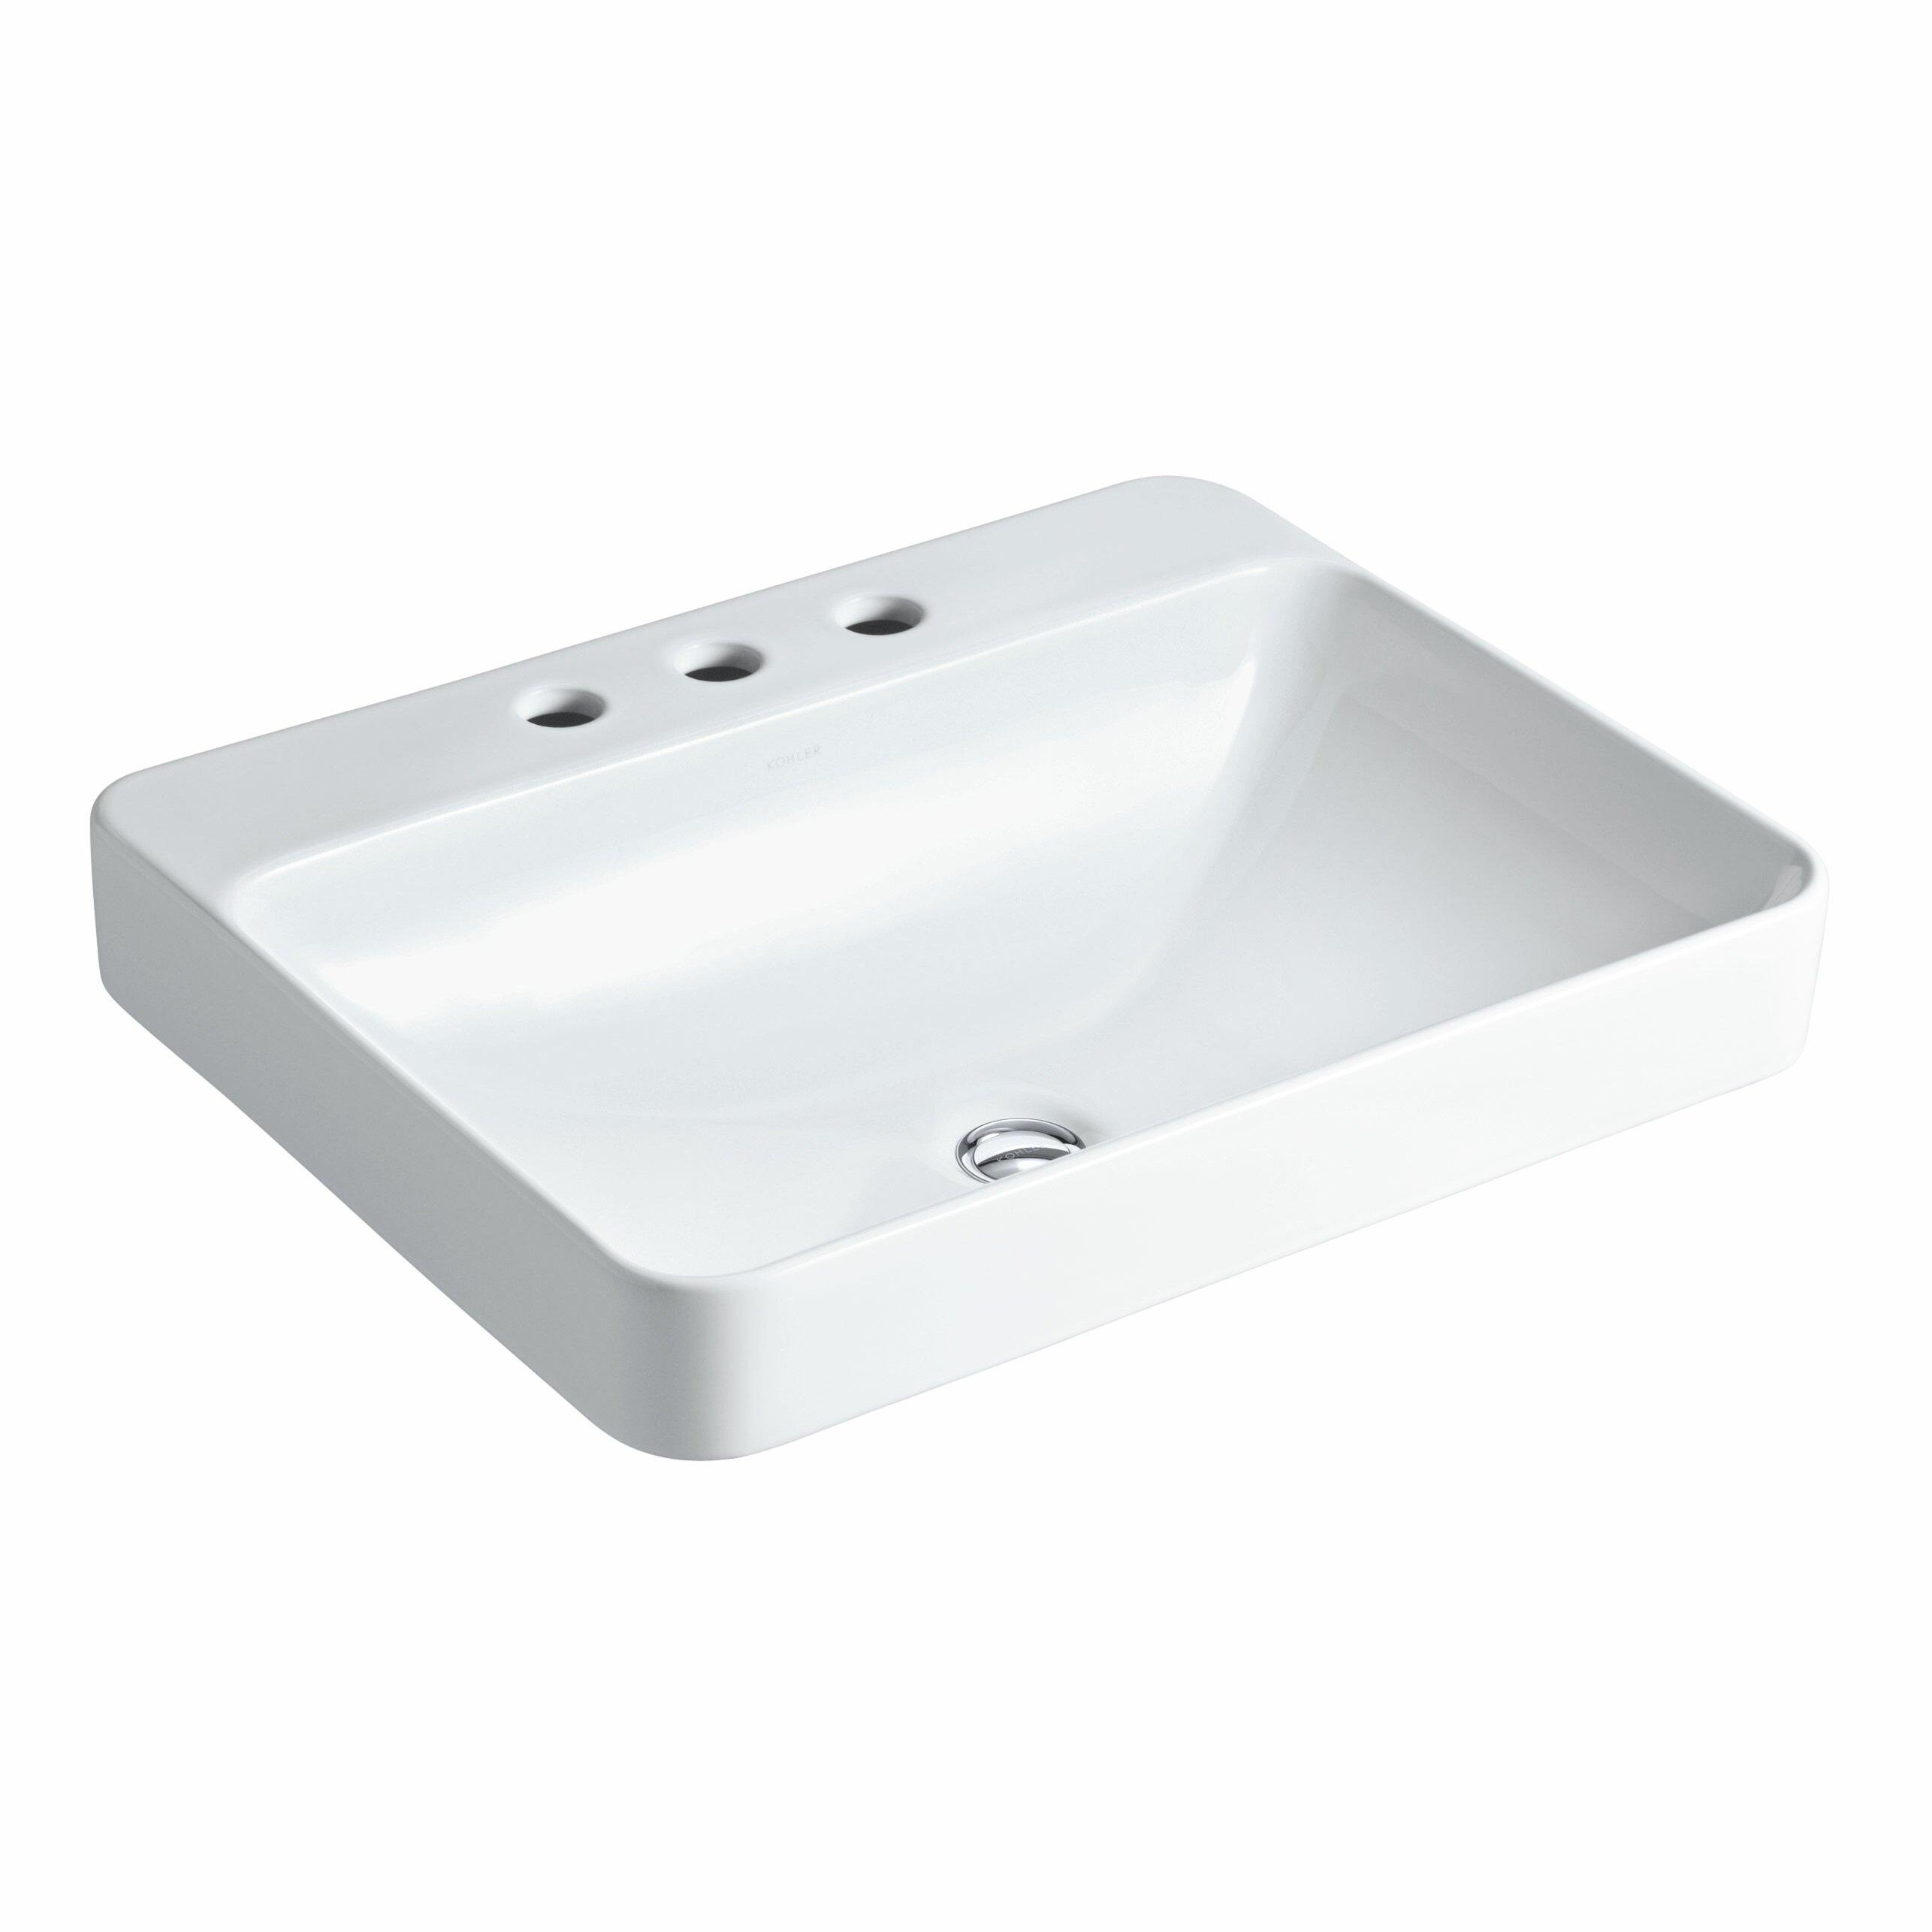 Kohler Vox Rectangular Vessel Above Counter Bathroom Sink Reviews Wayfair